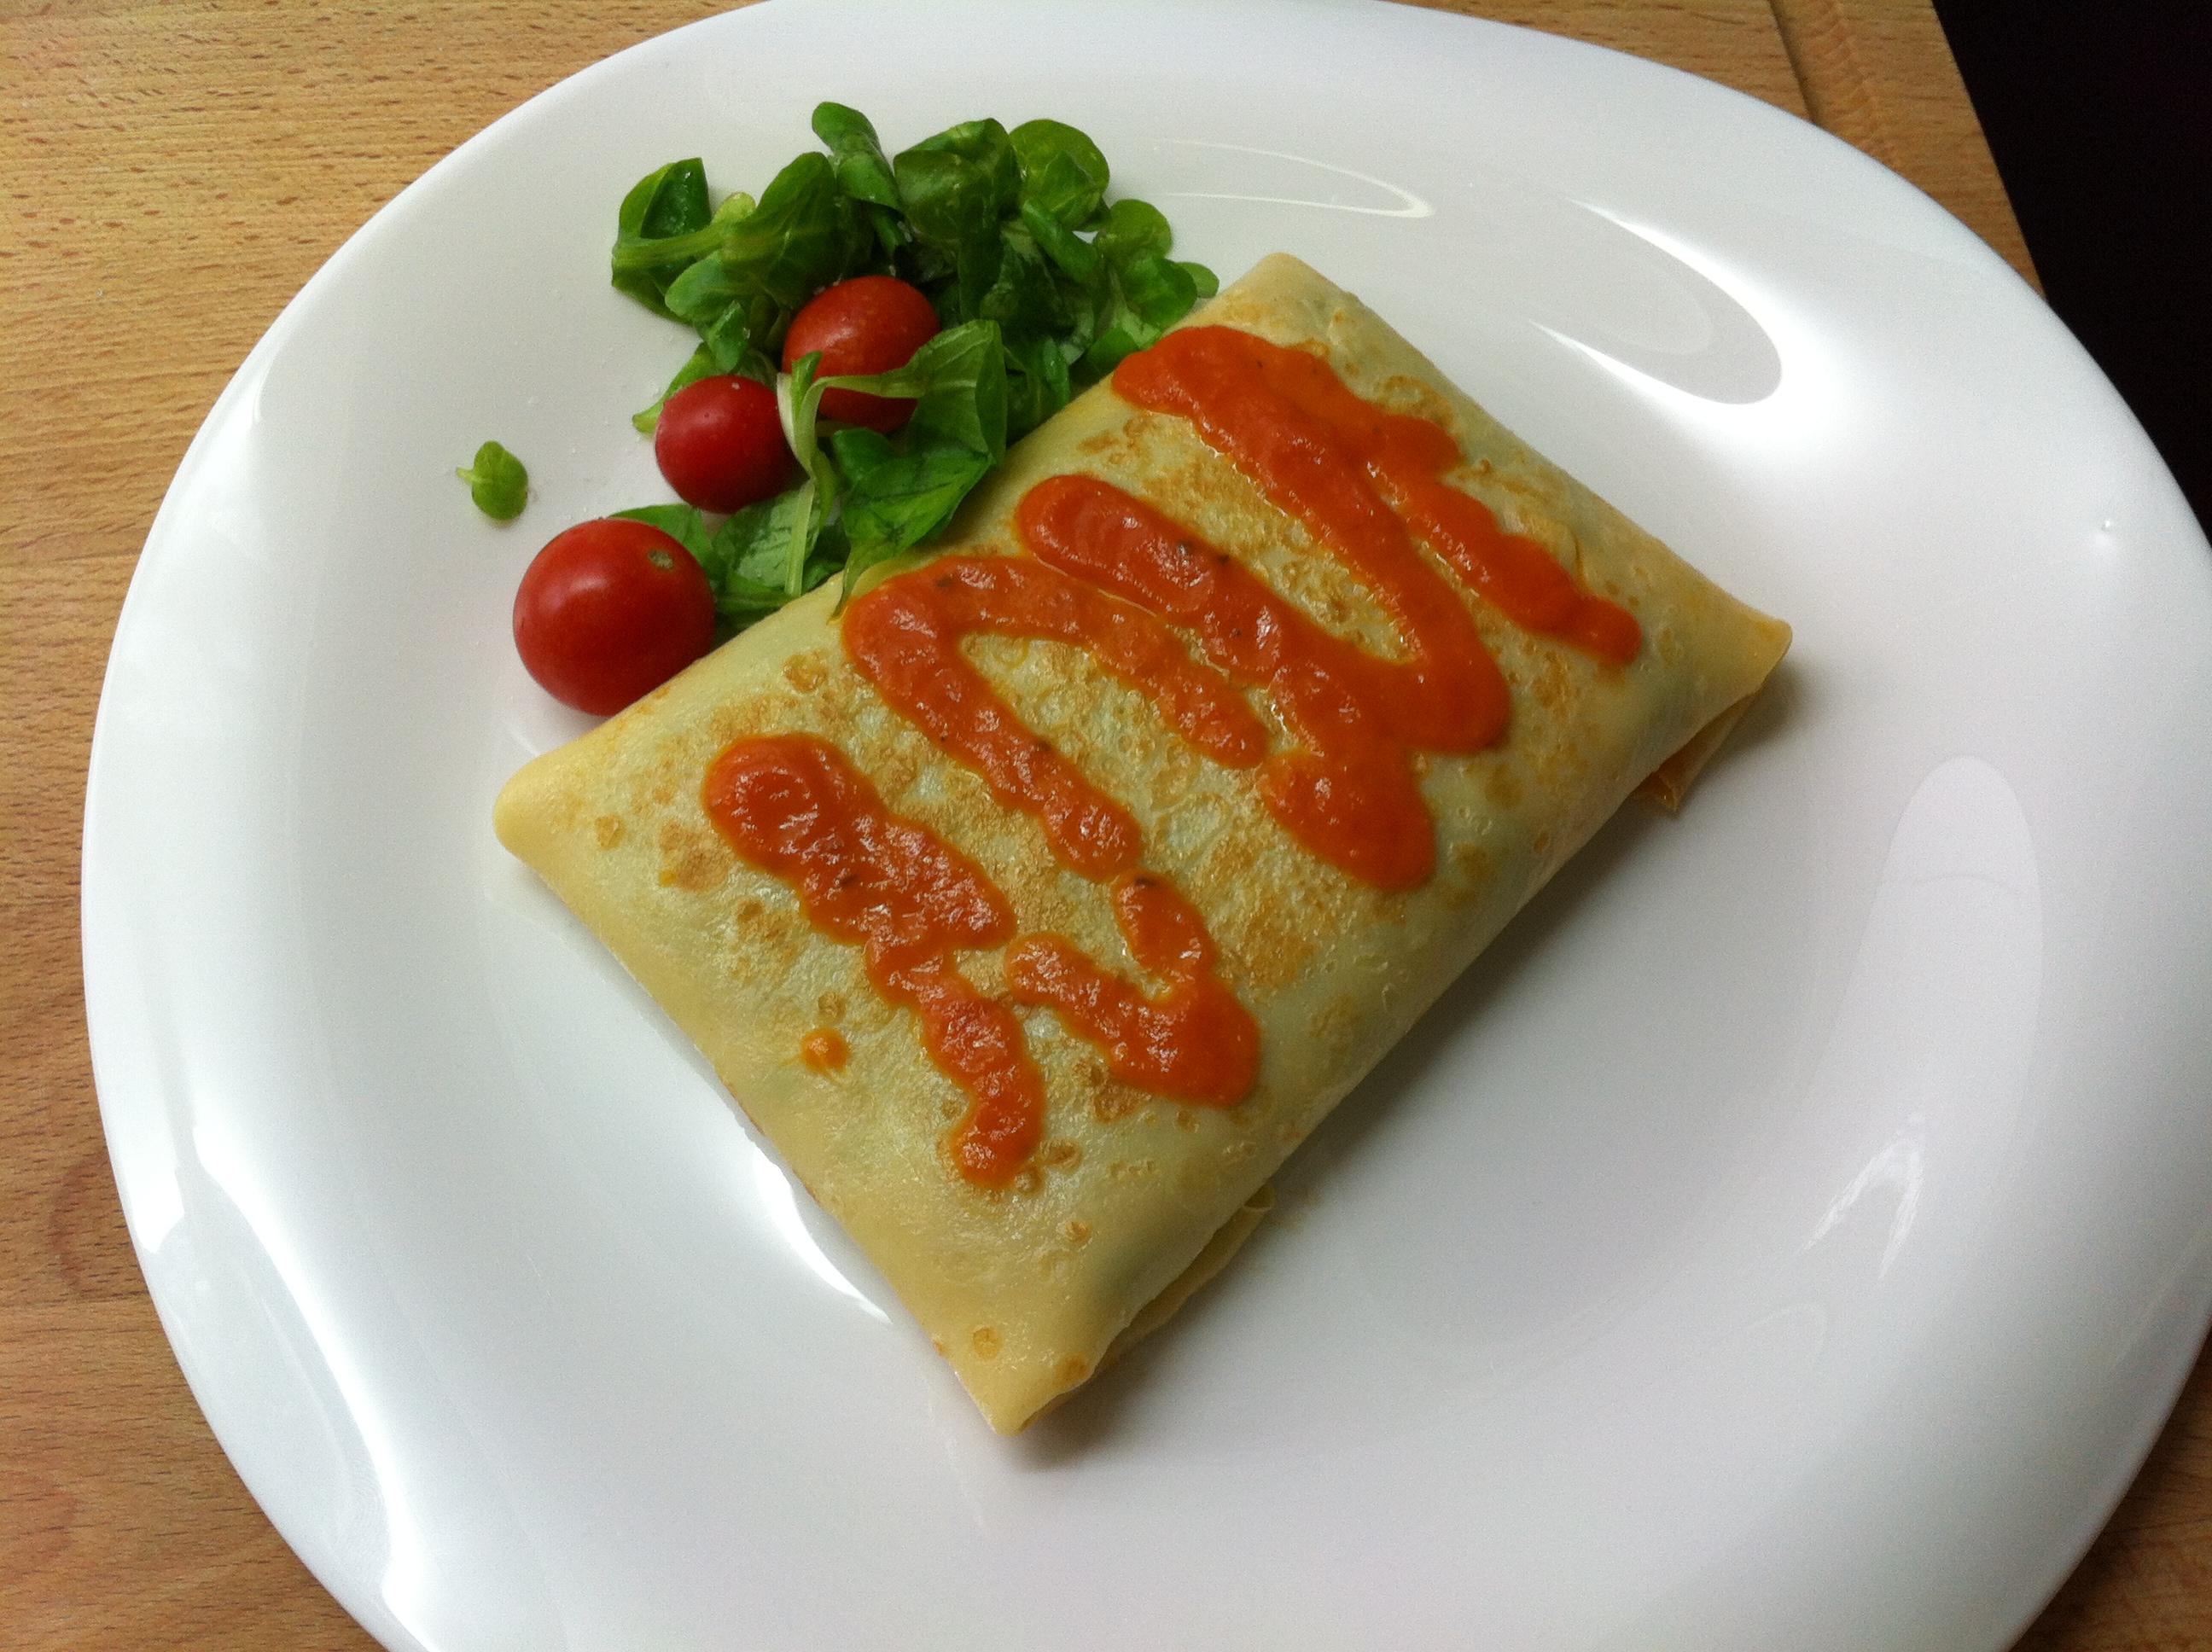 consejo comida casera